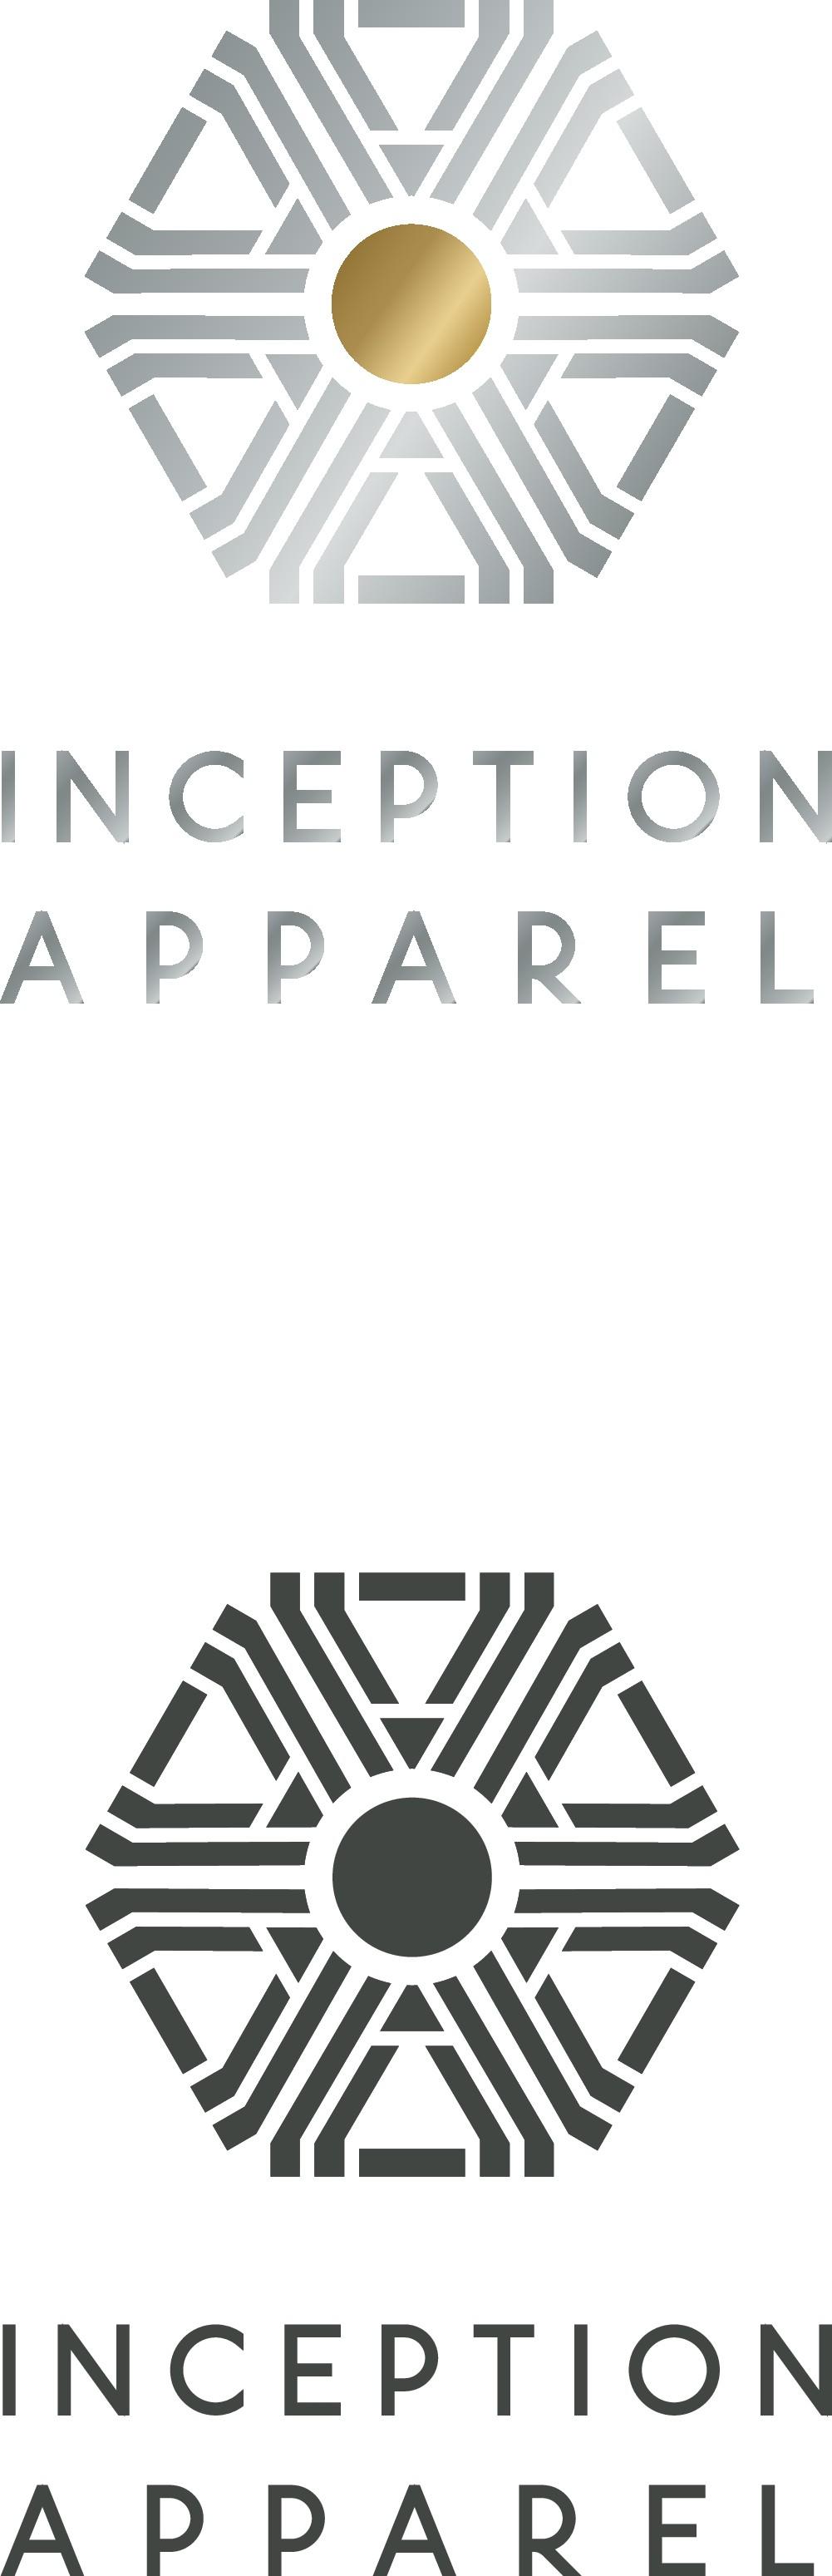 E-commerce fashion company seeks inventive logo